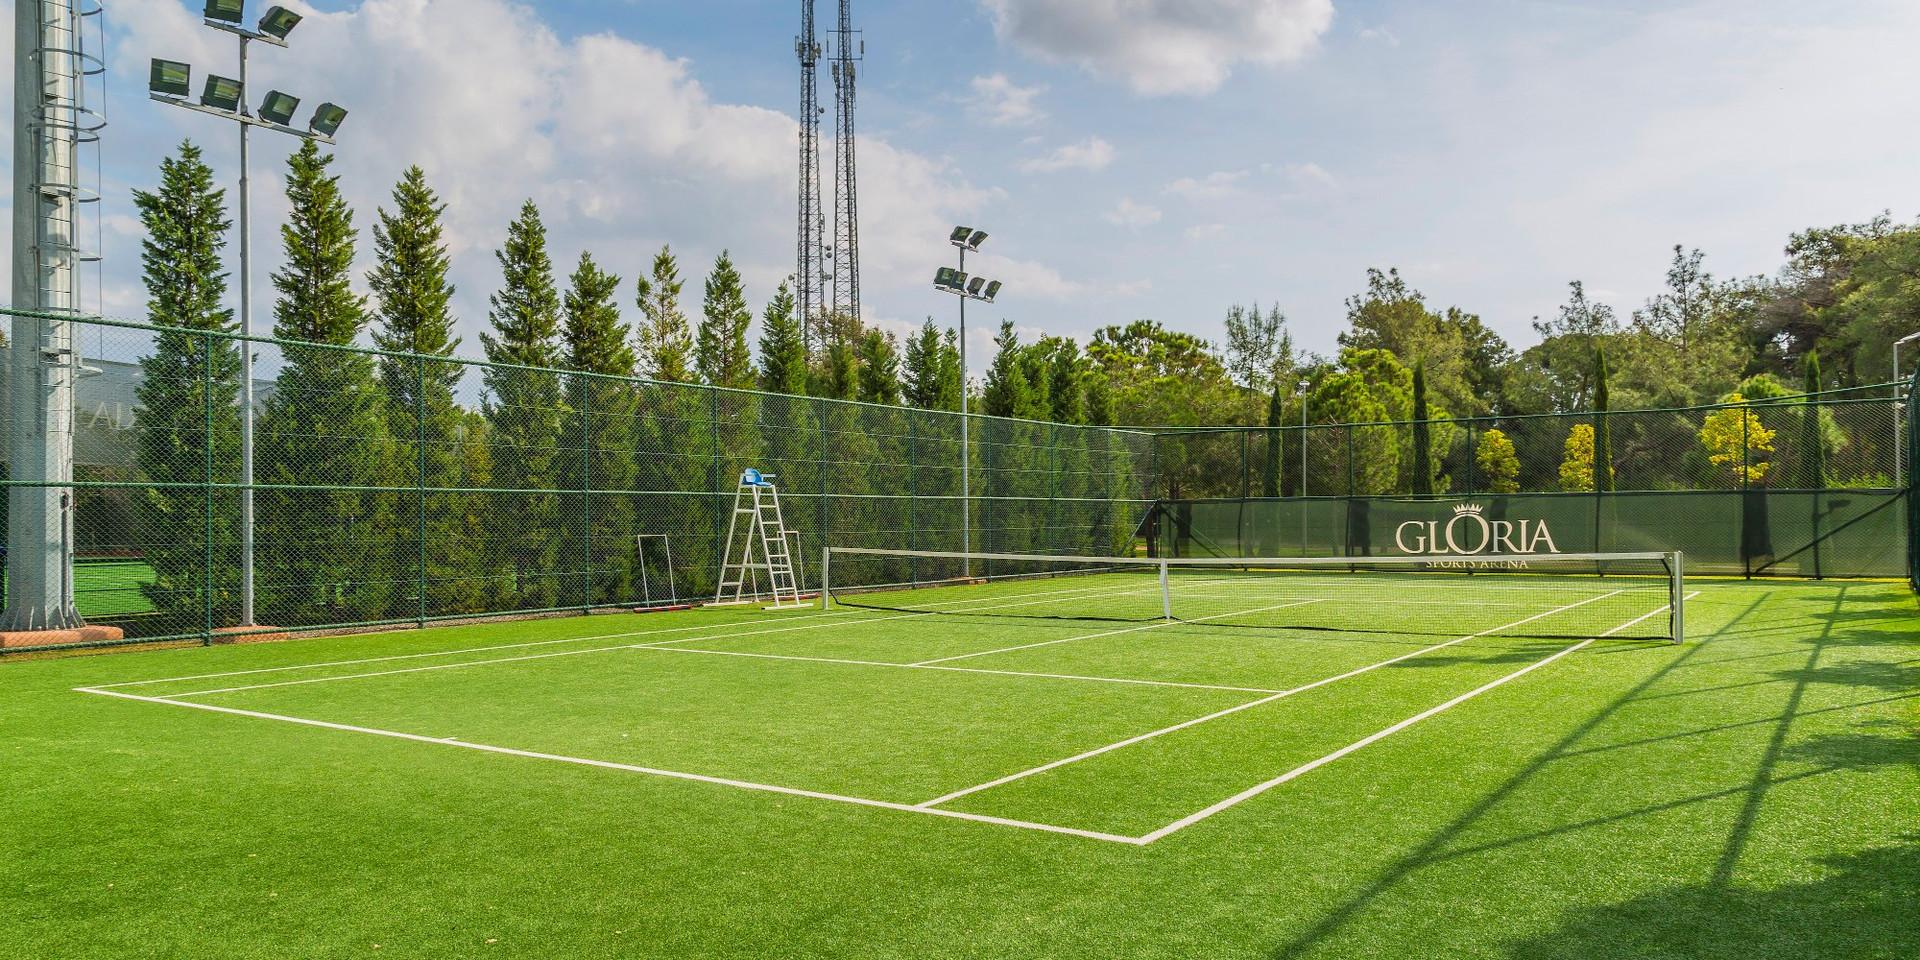 outdoor-sports-facilities (2).jpg